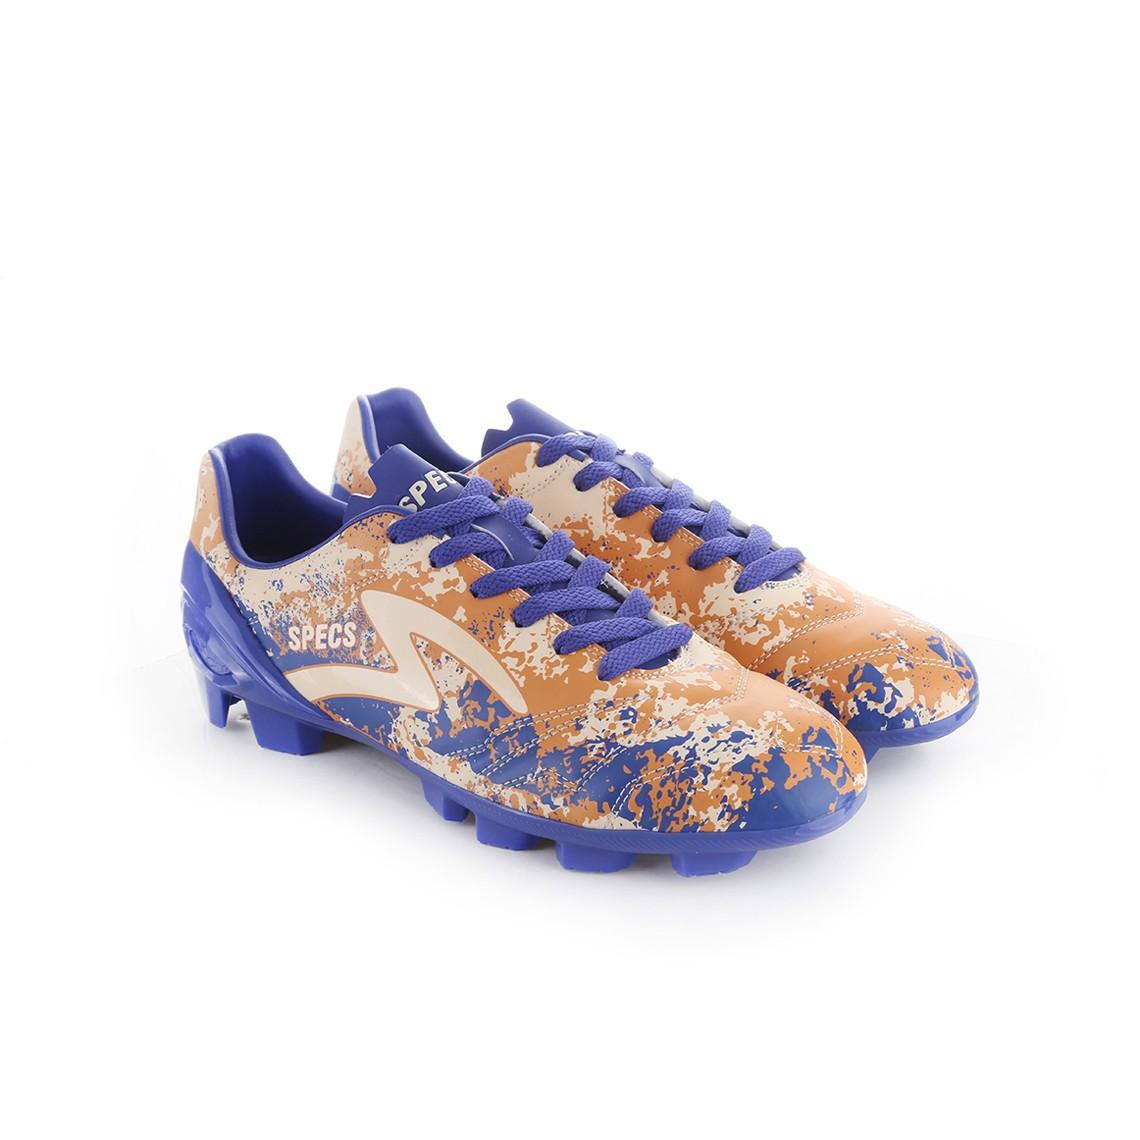 Specs Geronimo FG | Sepatu Sepak Bola